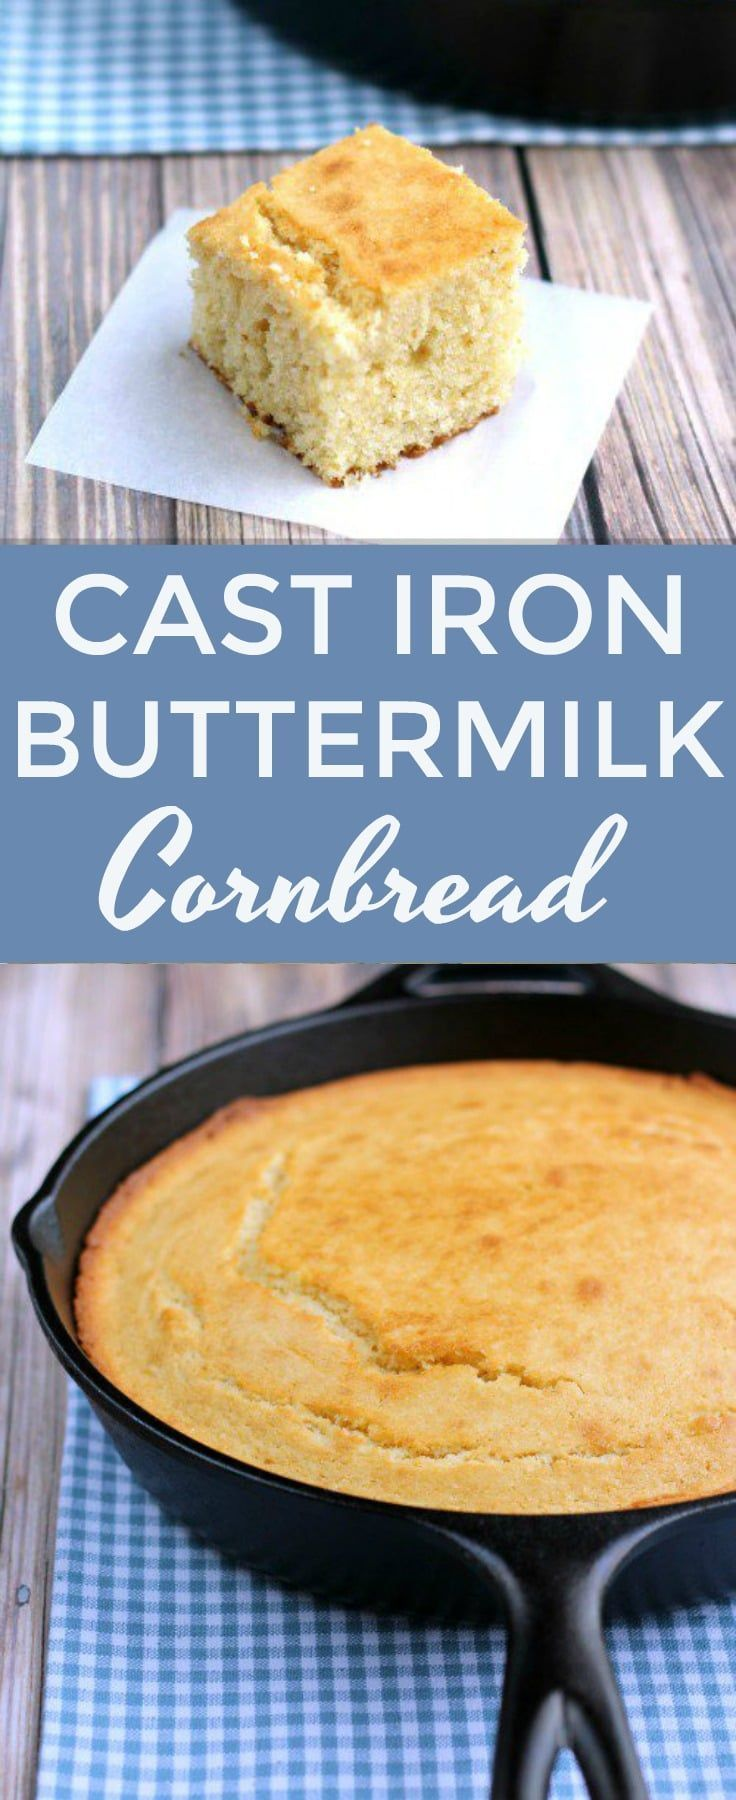 Cast Iron Buttermilk Cornbread Recipe Buttermilk Cornbread Food Recipes Southern Recipes